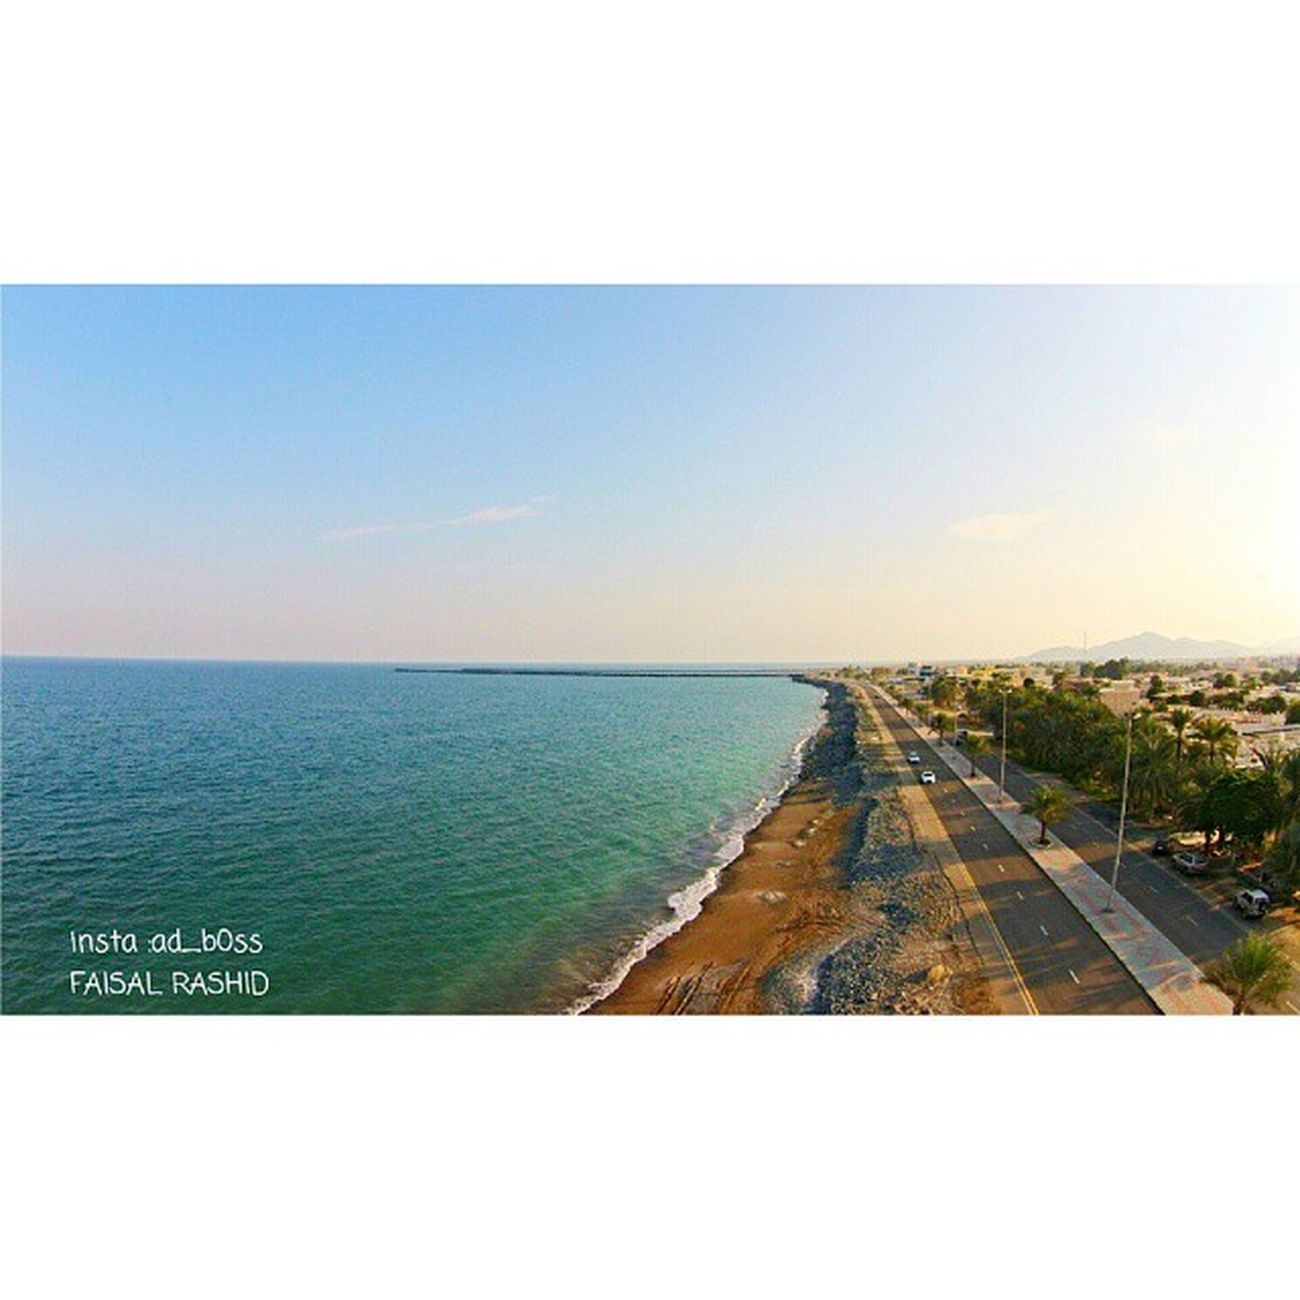 Kalba corniche Dji Phantom Plus 2vision kalba uae beach adboss